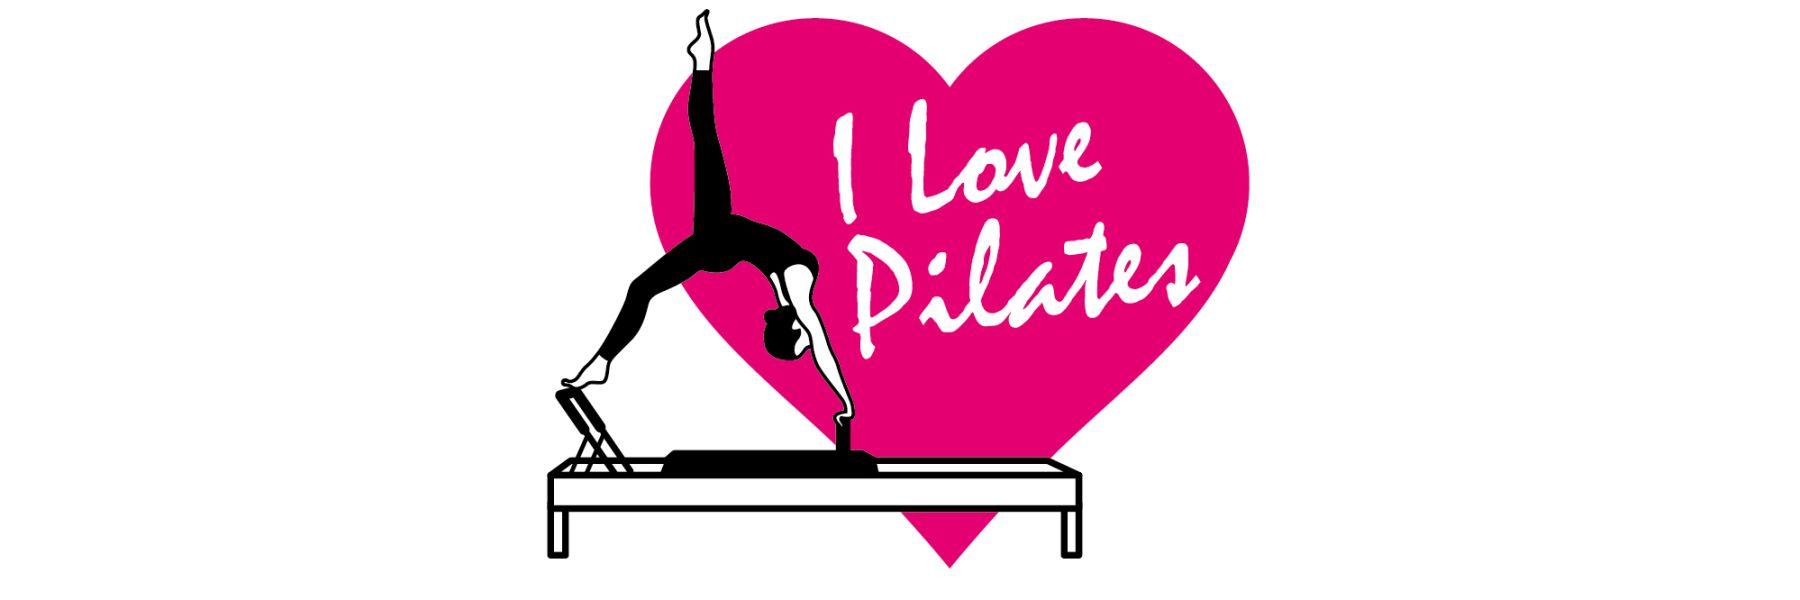 I Love Pilates BKK image